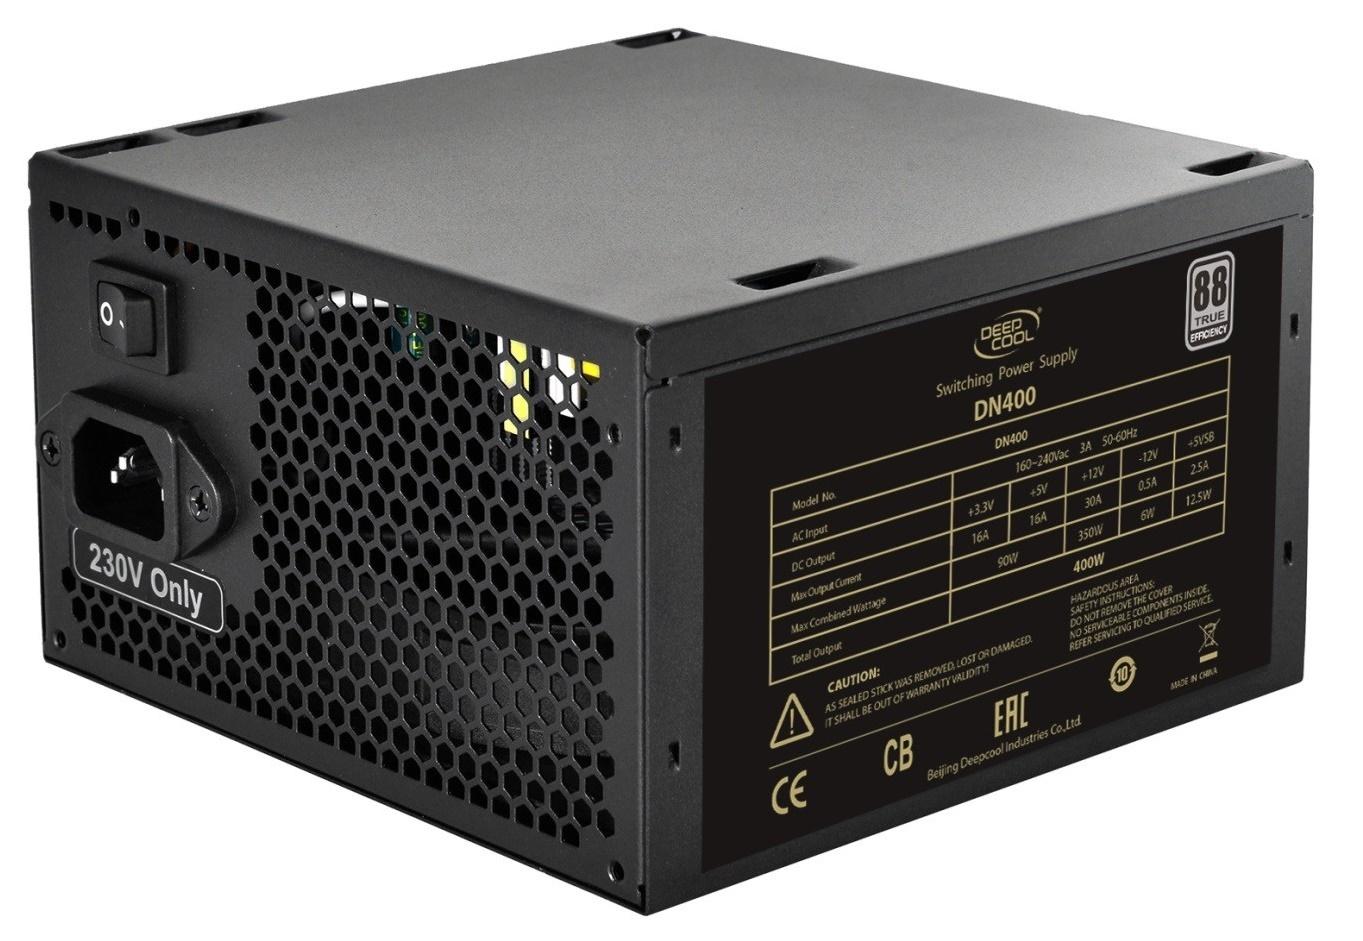 Deepcool 400w Psu 88 Efficiency Meps Compliant At Mighty Ape Nz Deep Cool Z5 Image